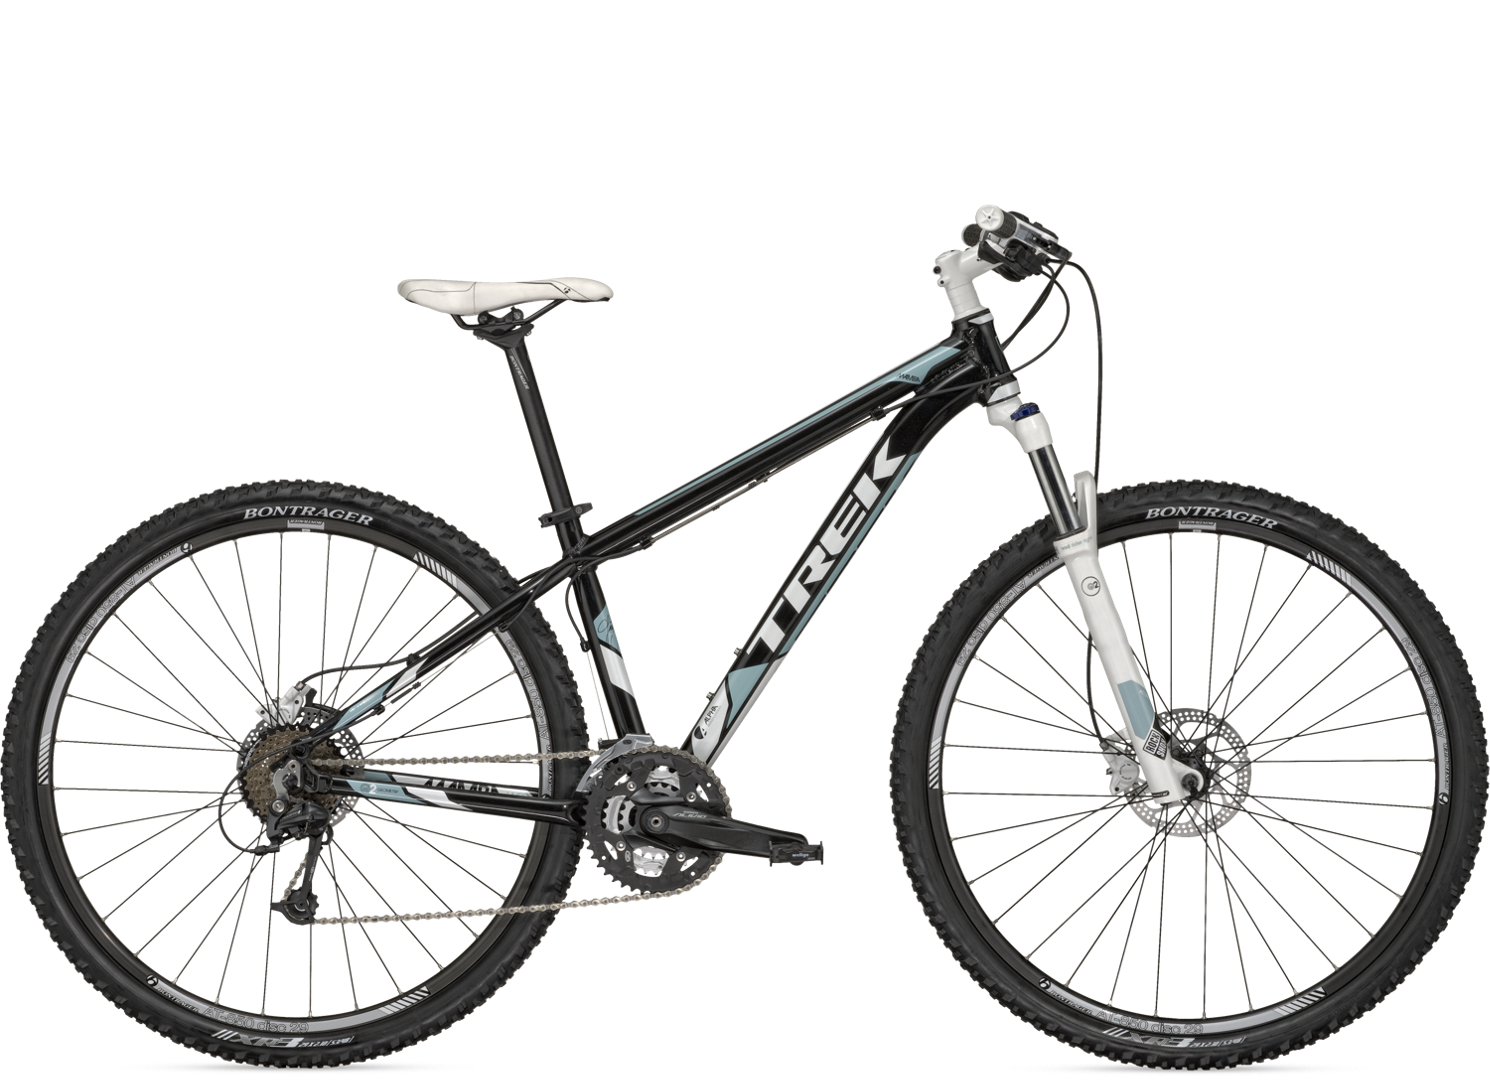 0f41520da92 2012 Mamba WSD - Bike Archive - Trek Bicycle